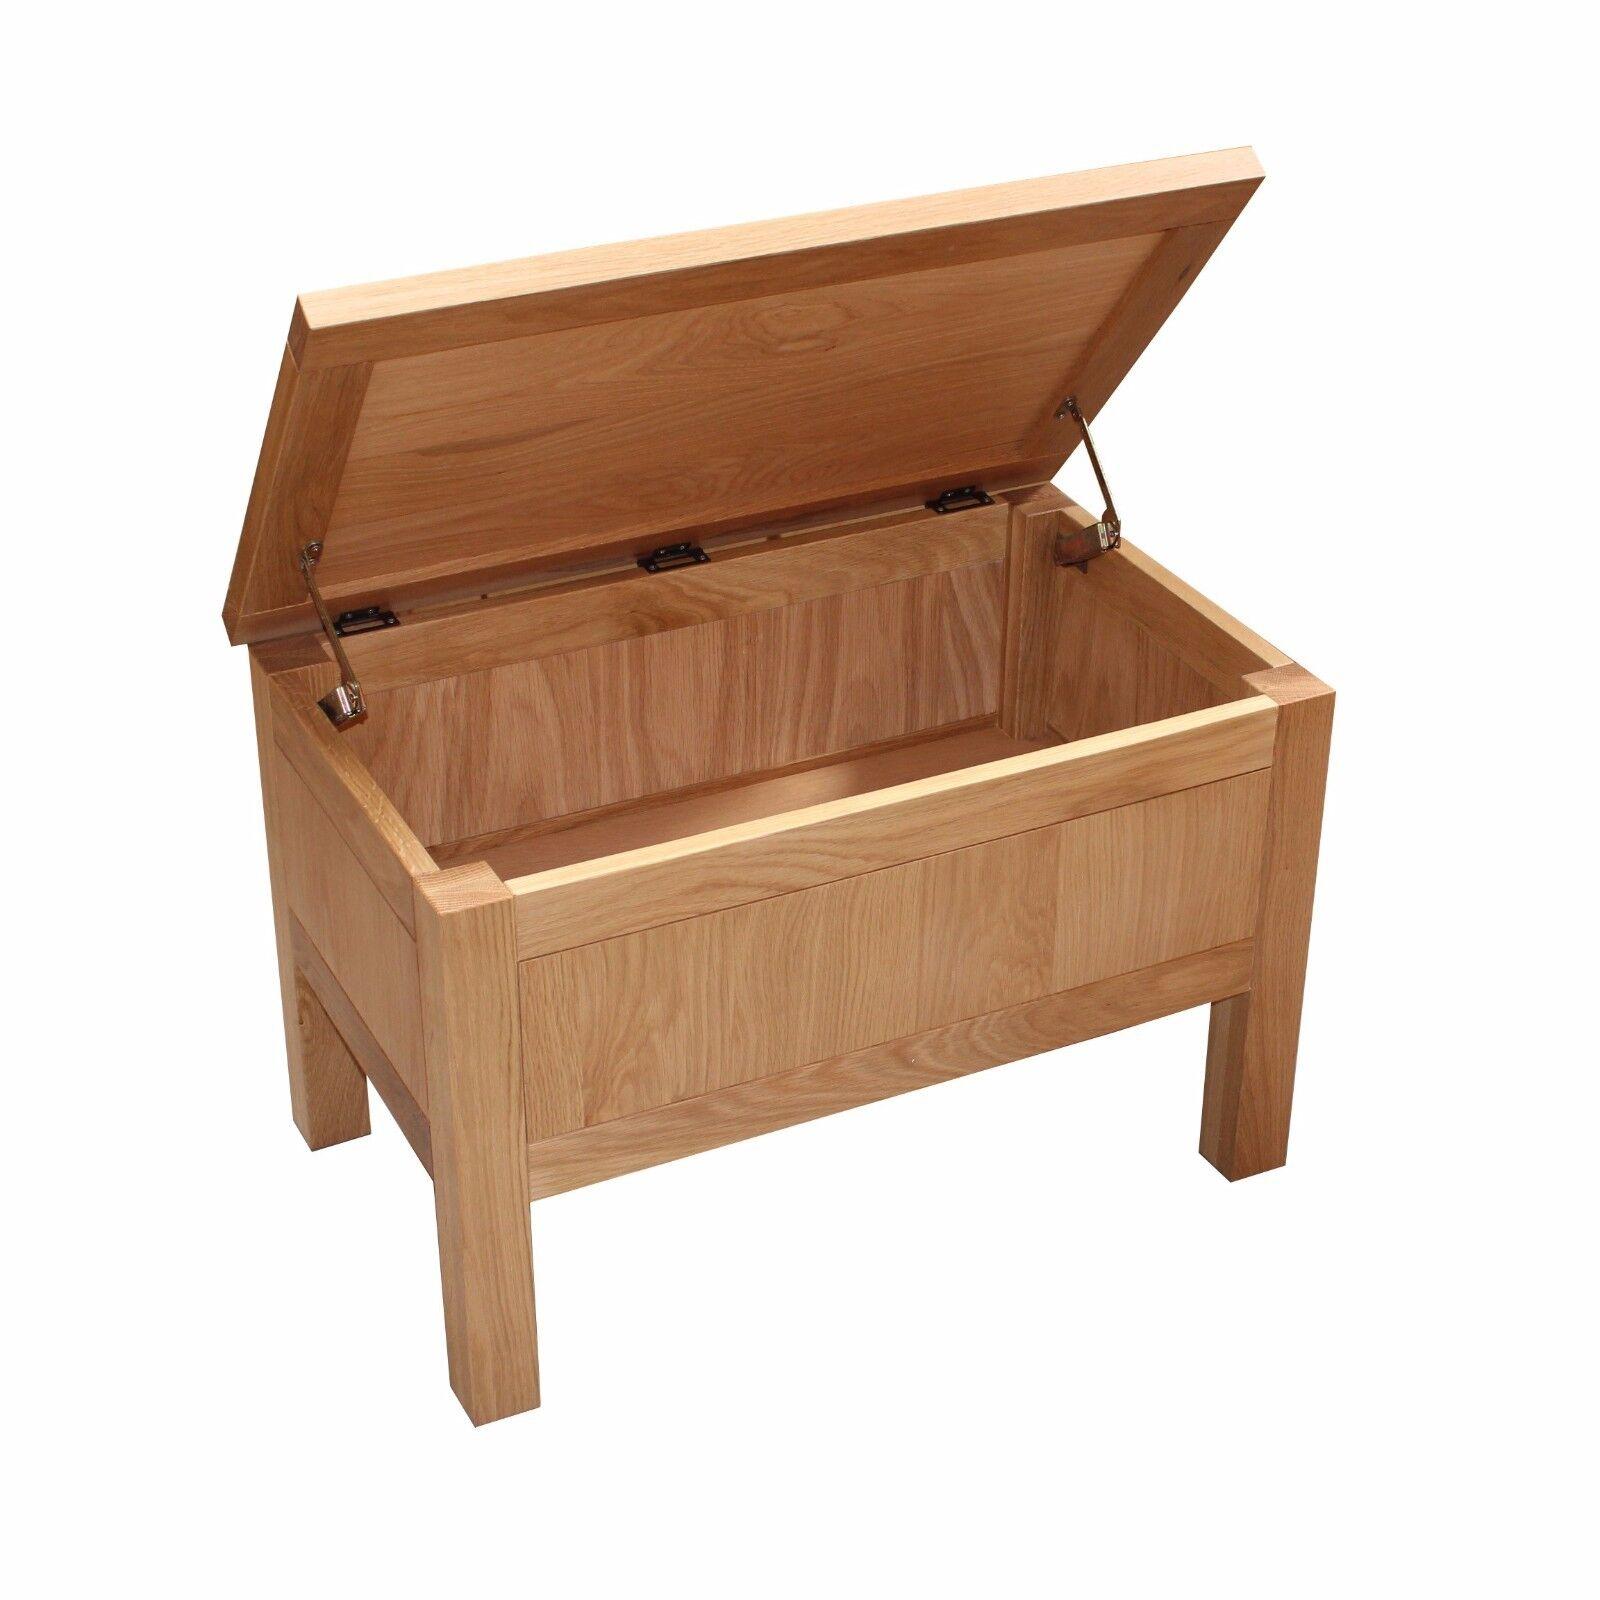 Coffee Table With Storage Ebay: Oak Storage Box Coffee Table Toy Box Blanket Box